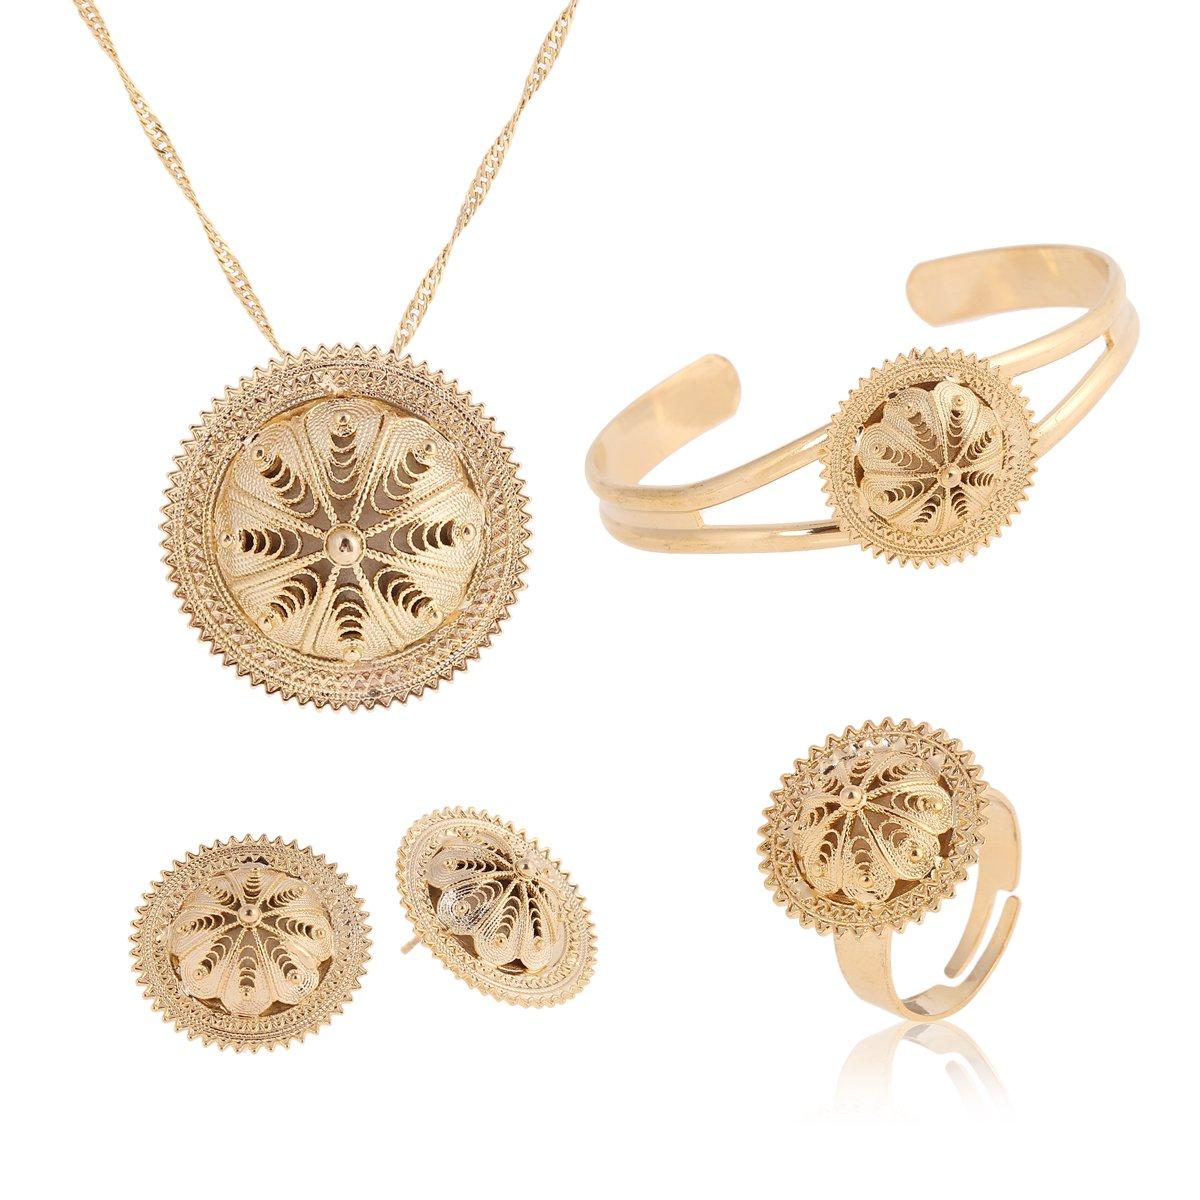 Hat Habesha Jewelry Gift Gold Plated Ethiopian Necklace Pendant Earring Ring Bangle Sets Yiwu Bangrui Jewelry Co. Ltd S-0010